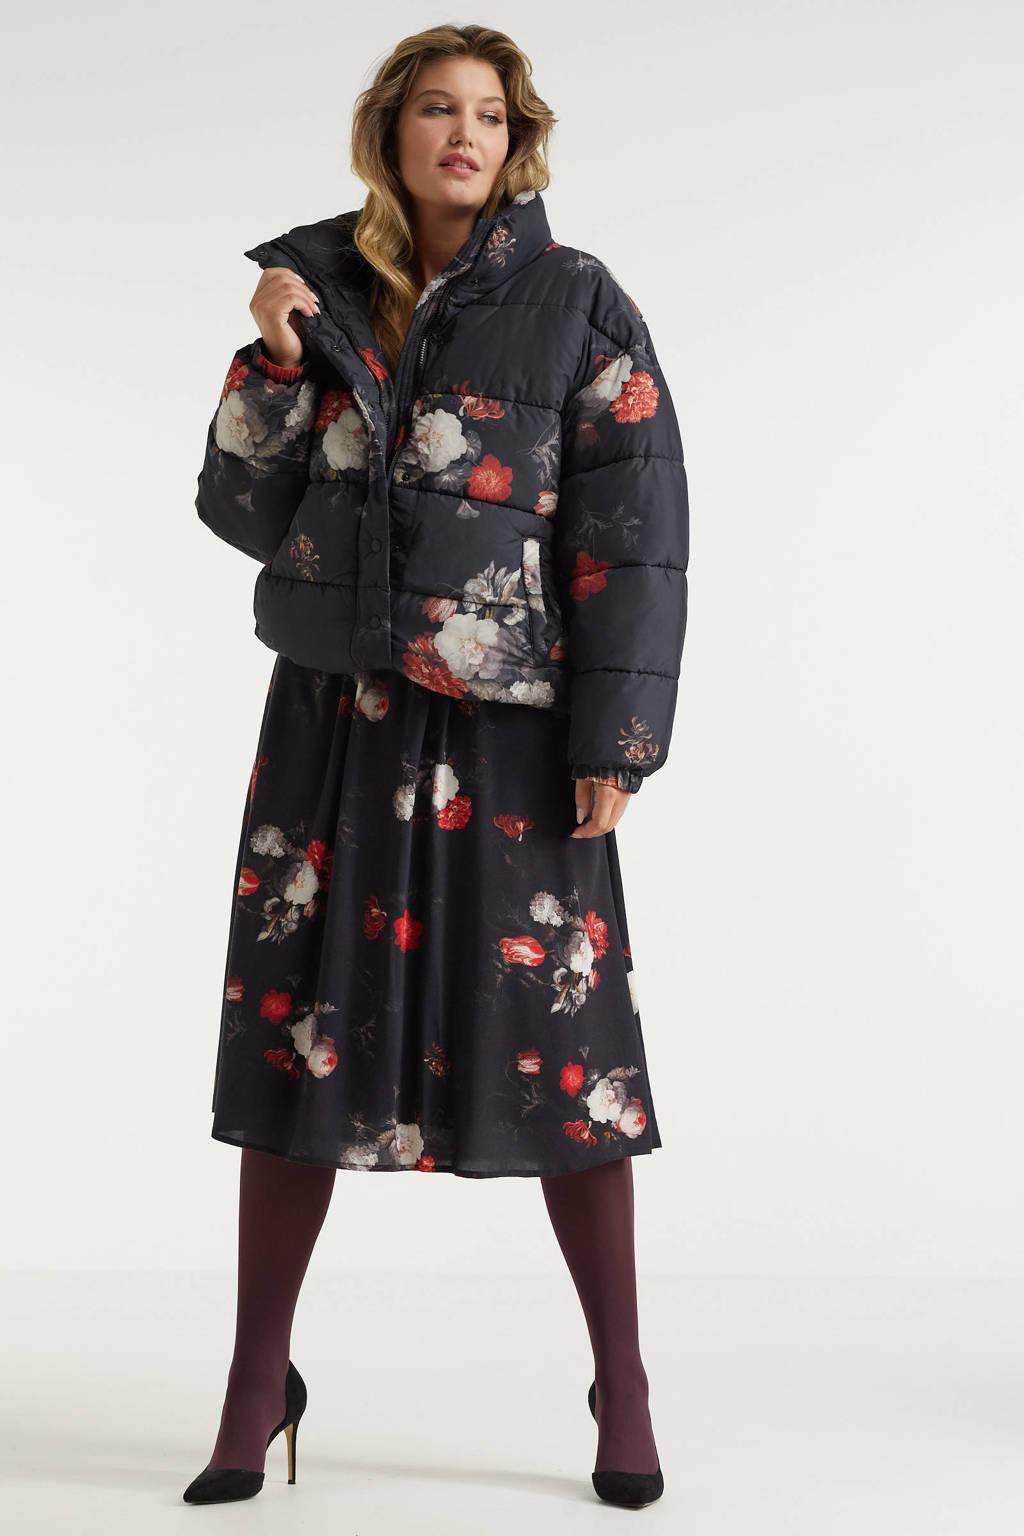 Miljuschka by Wehkamp limited edition gewatteerde jas met bloemenprint rood, Zwart / rood